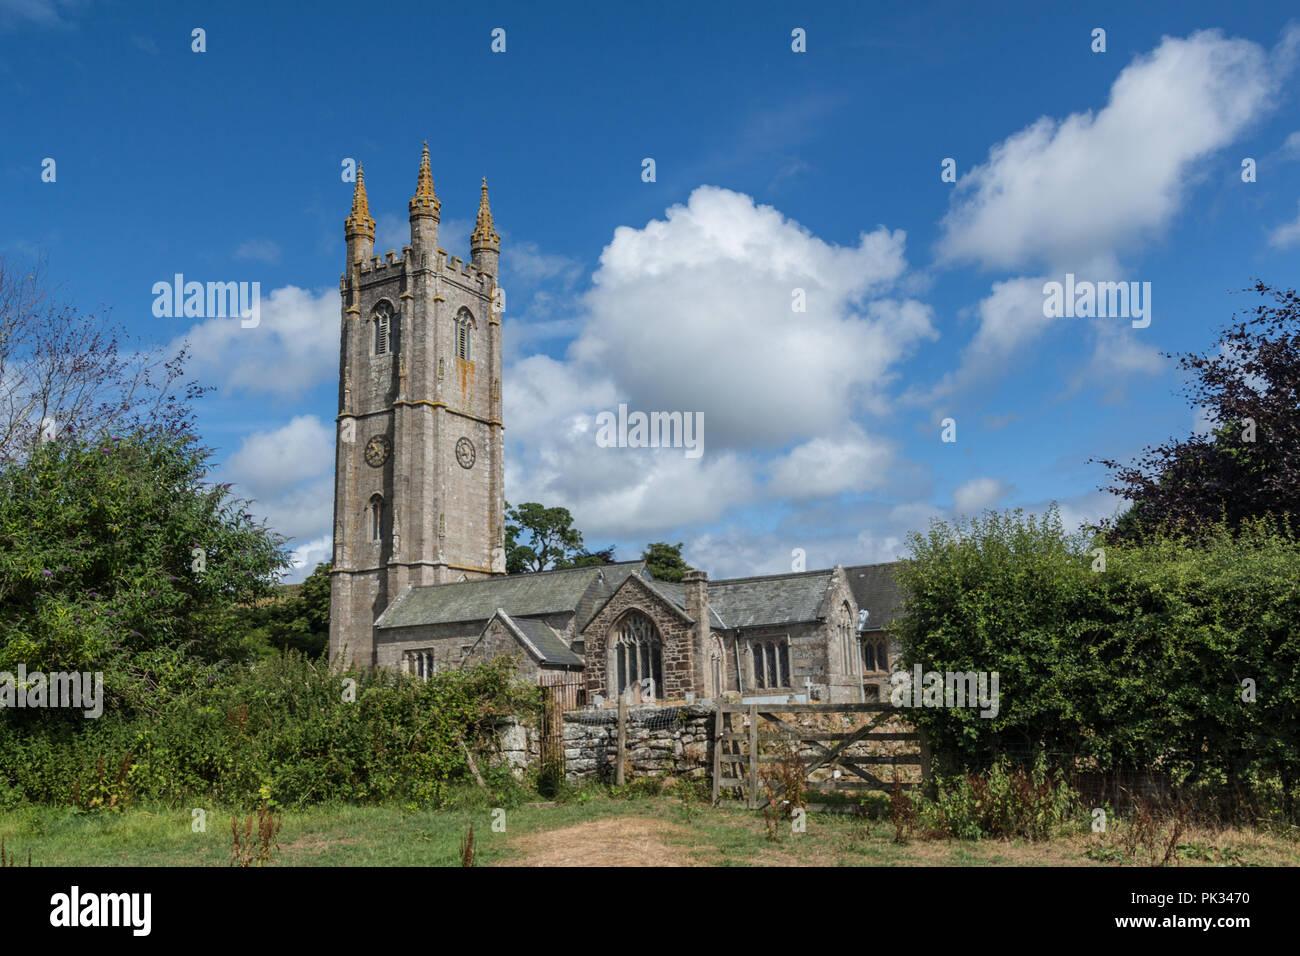 St Pancras Church, Widecombe-in-the-Moor, Devon, UK Stock Photo